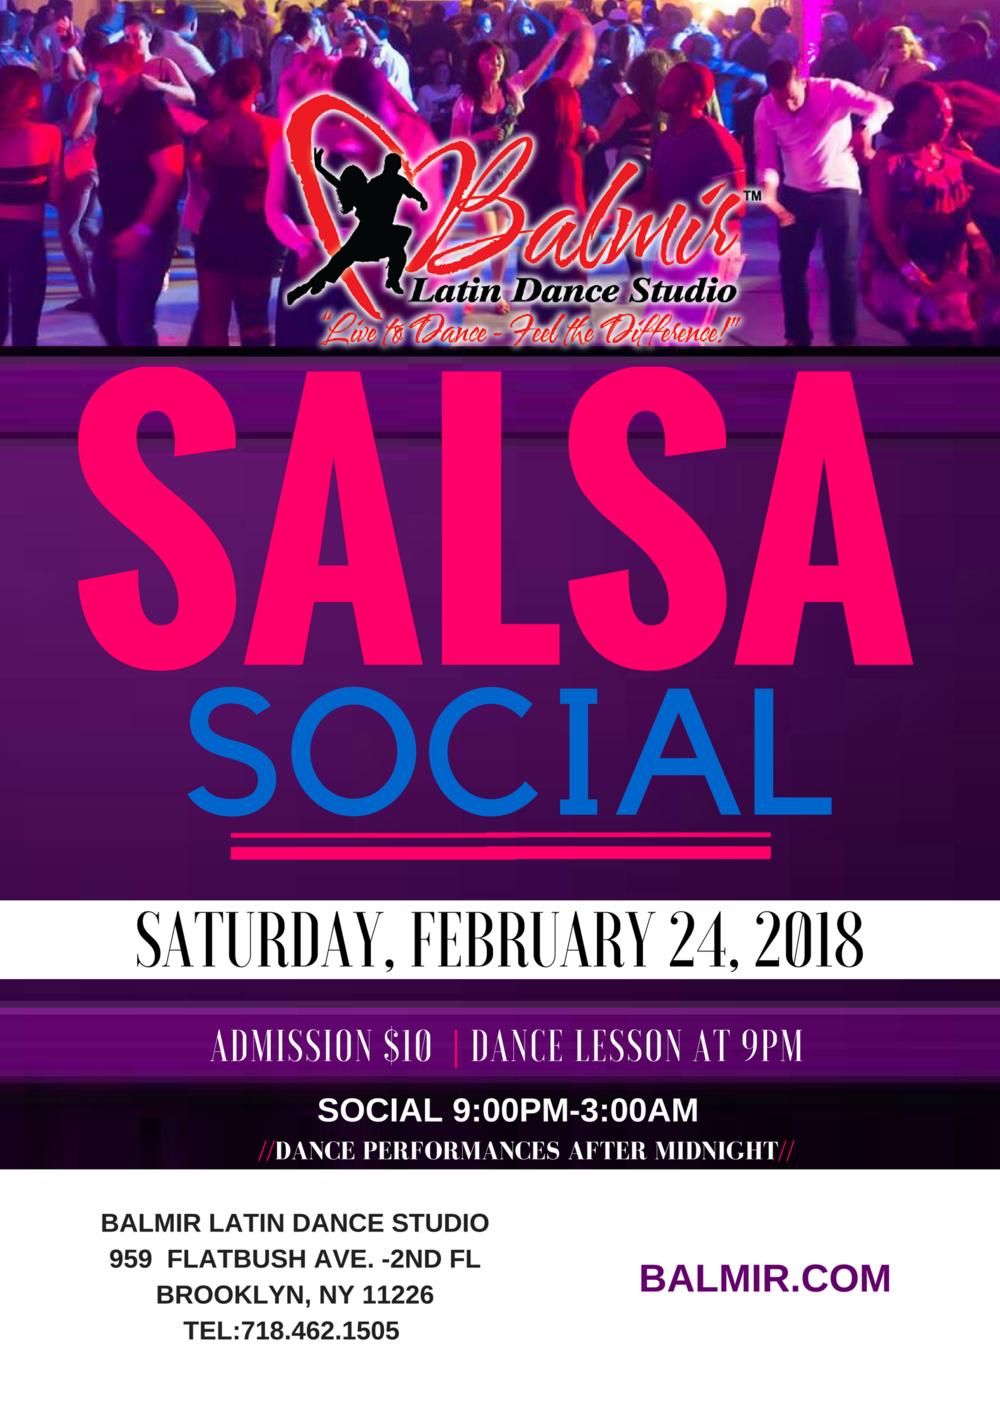 SALSA Dance Party Social Saturday February 21 2018 Balmir Latin Dance Studio Brooklyn